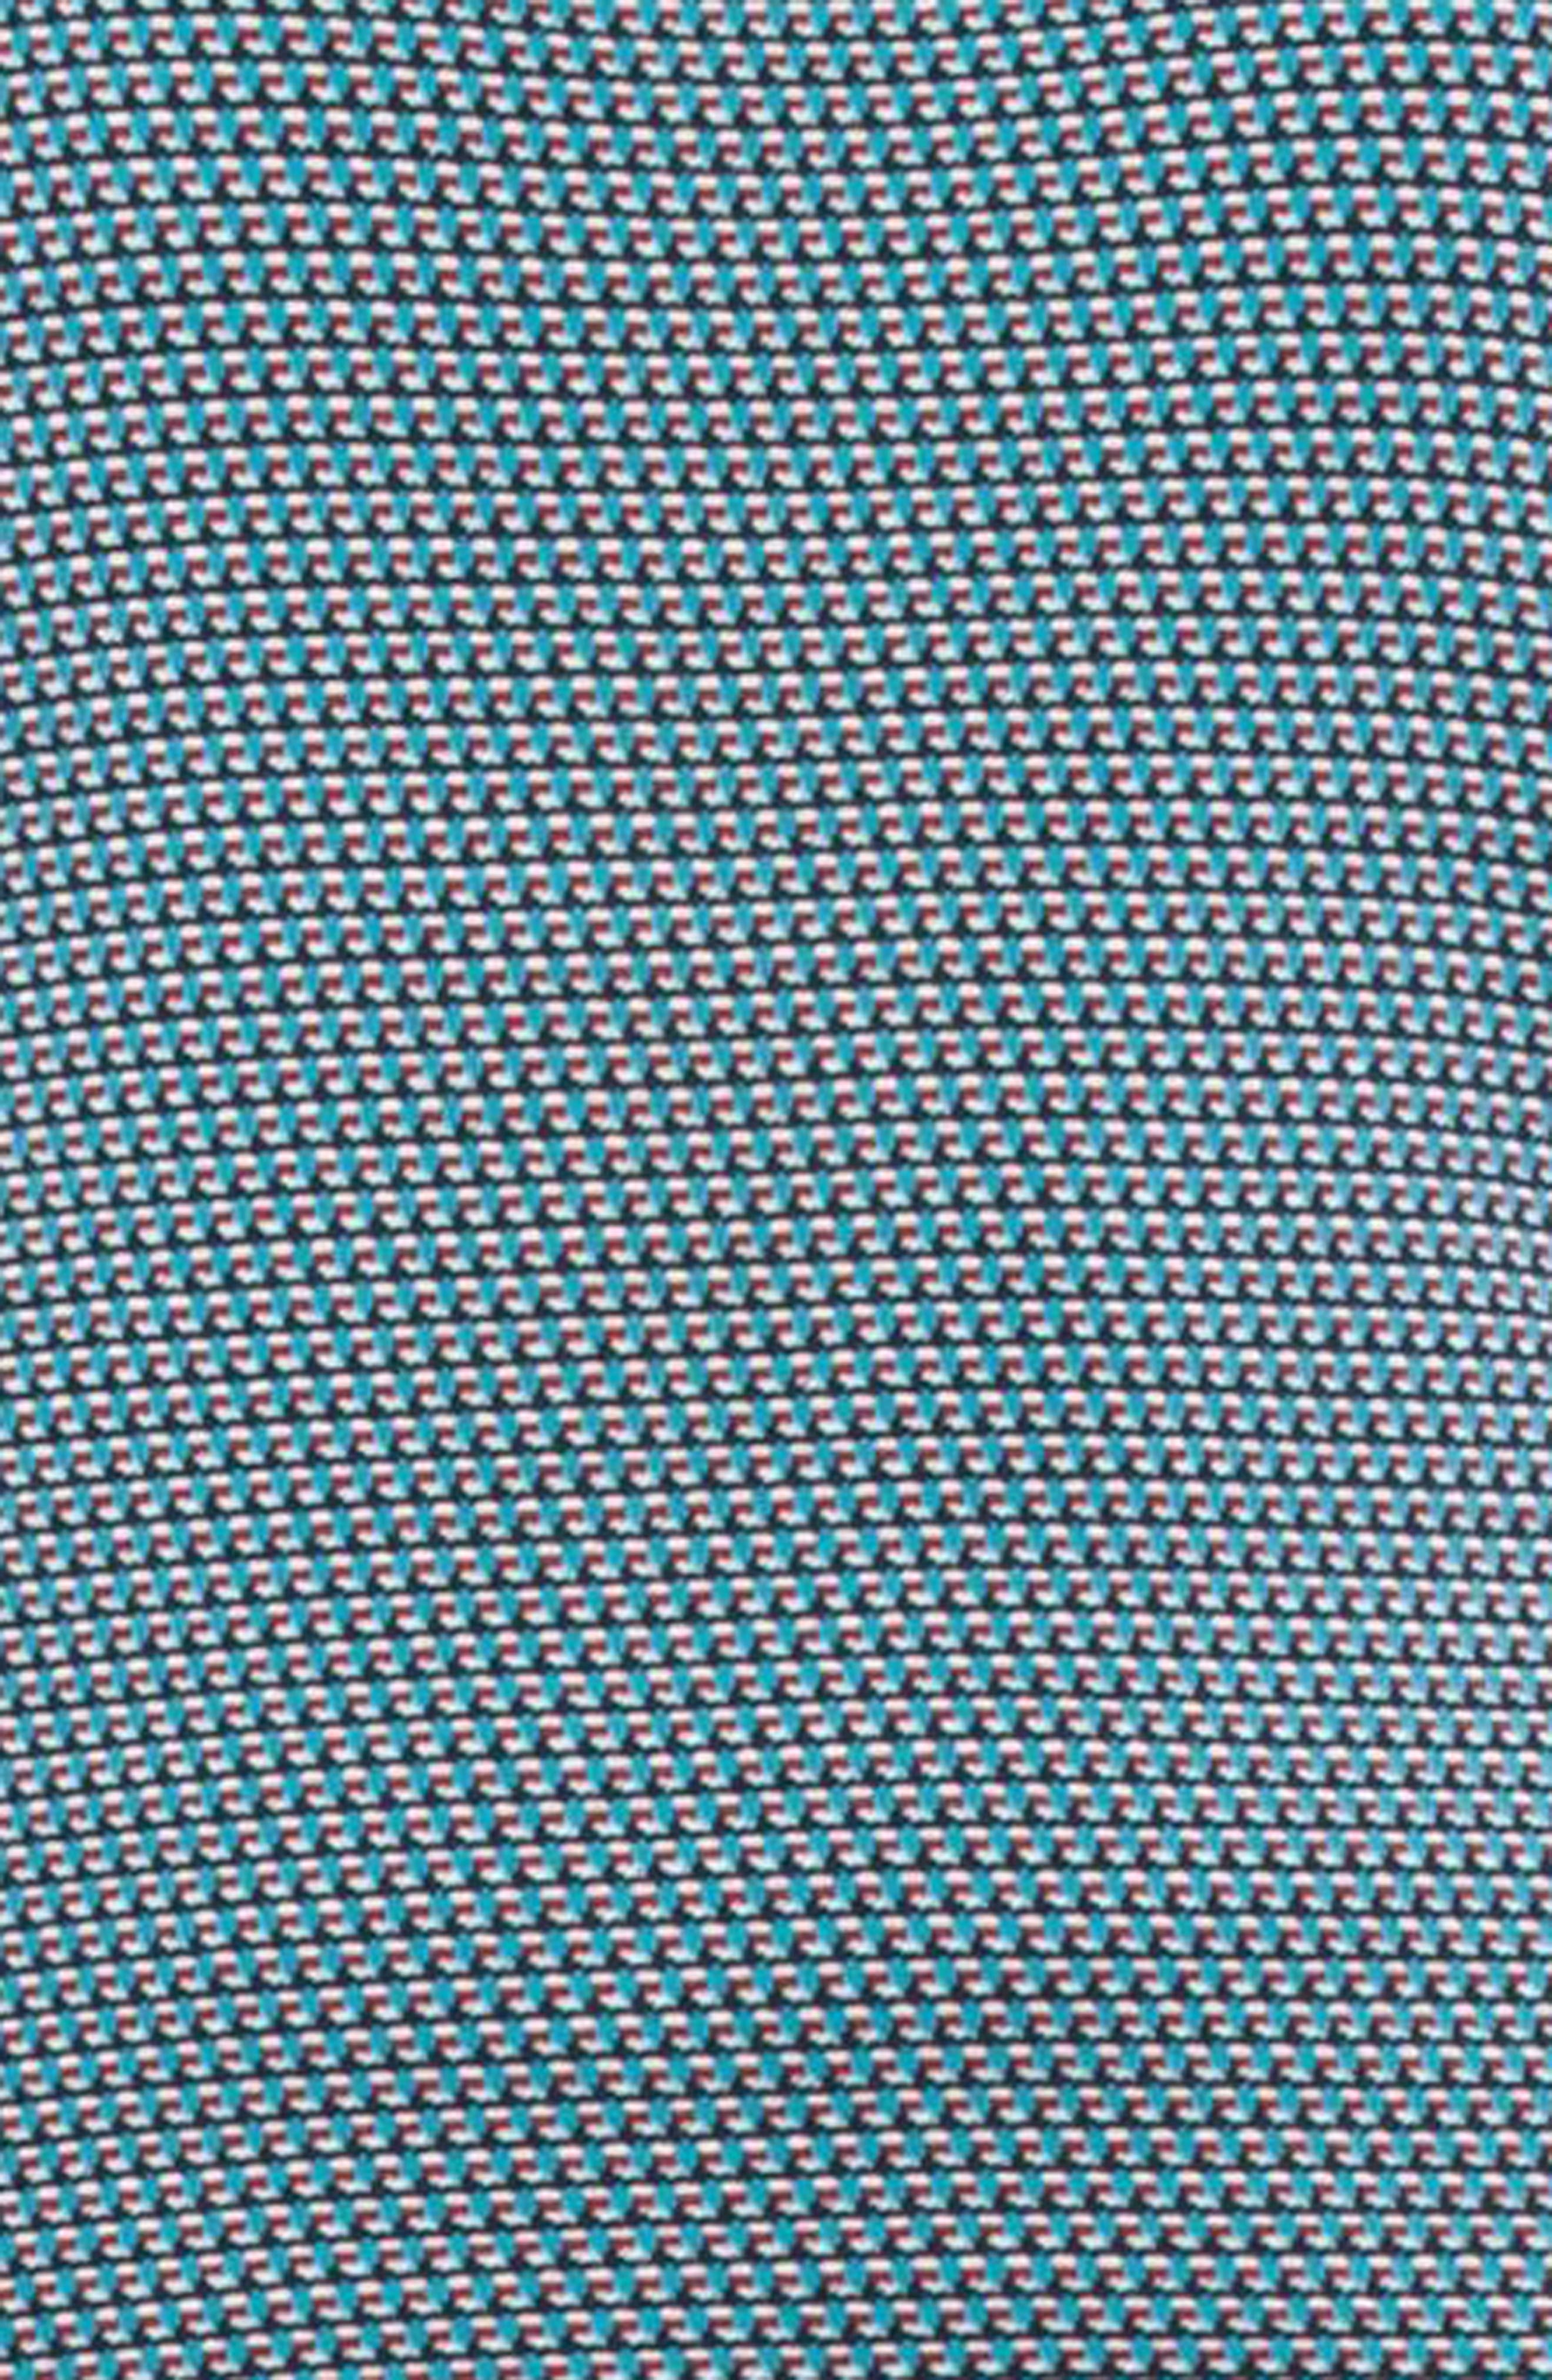 Fantasy Jacquard Knit Top,                             Alternate thumbnail 3, color,                             471